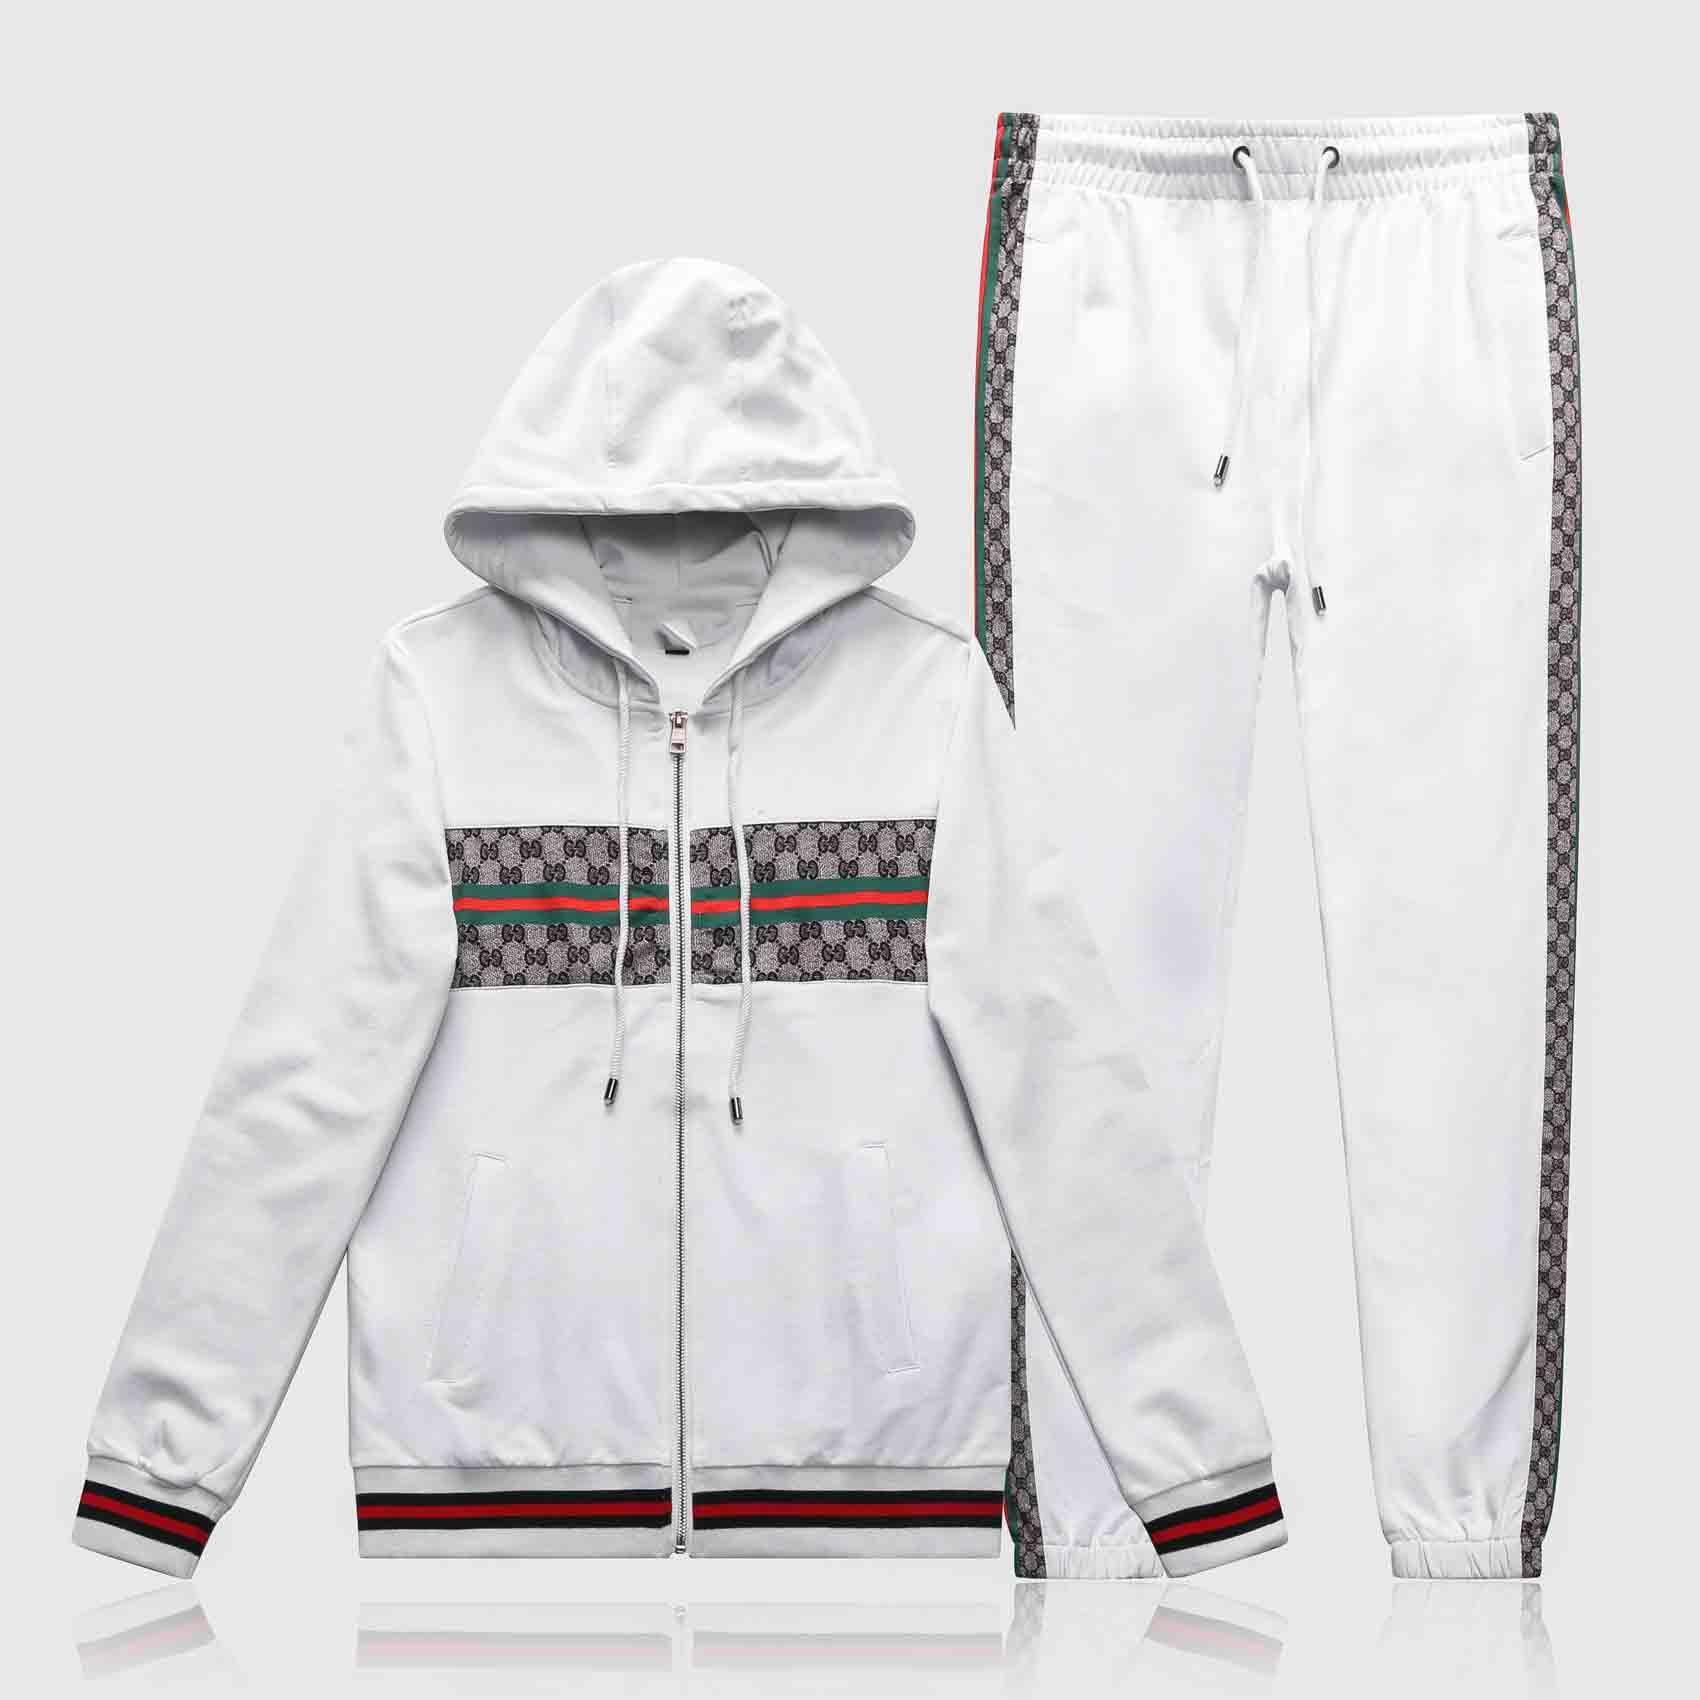 2020 NewHigh 품질 남성 스웨터 땀 정장 디자인 패션 남성 운동복 재킷 스포츠는 조깅 정장을 설정합니다